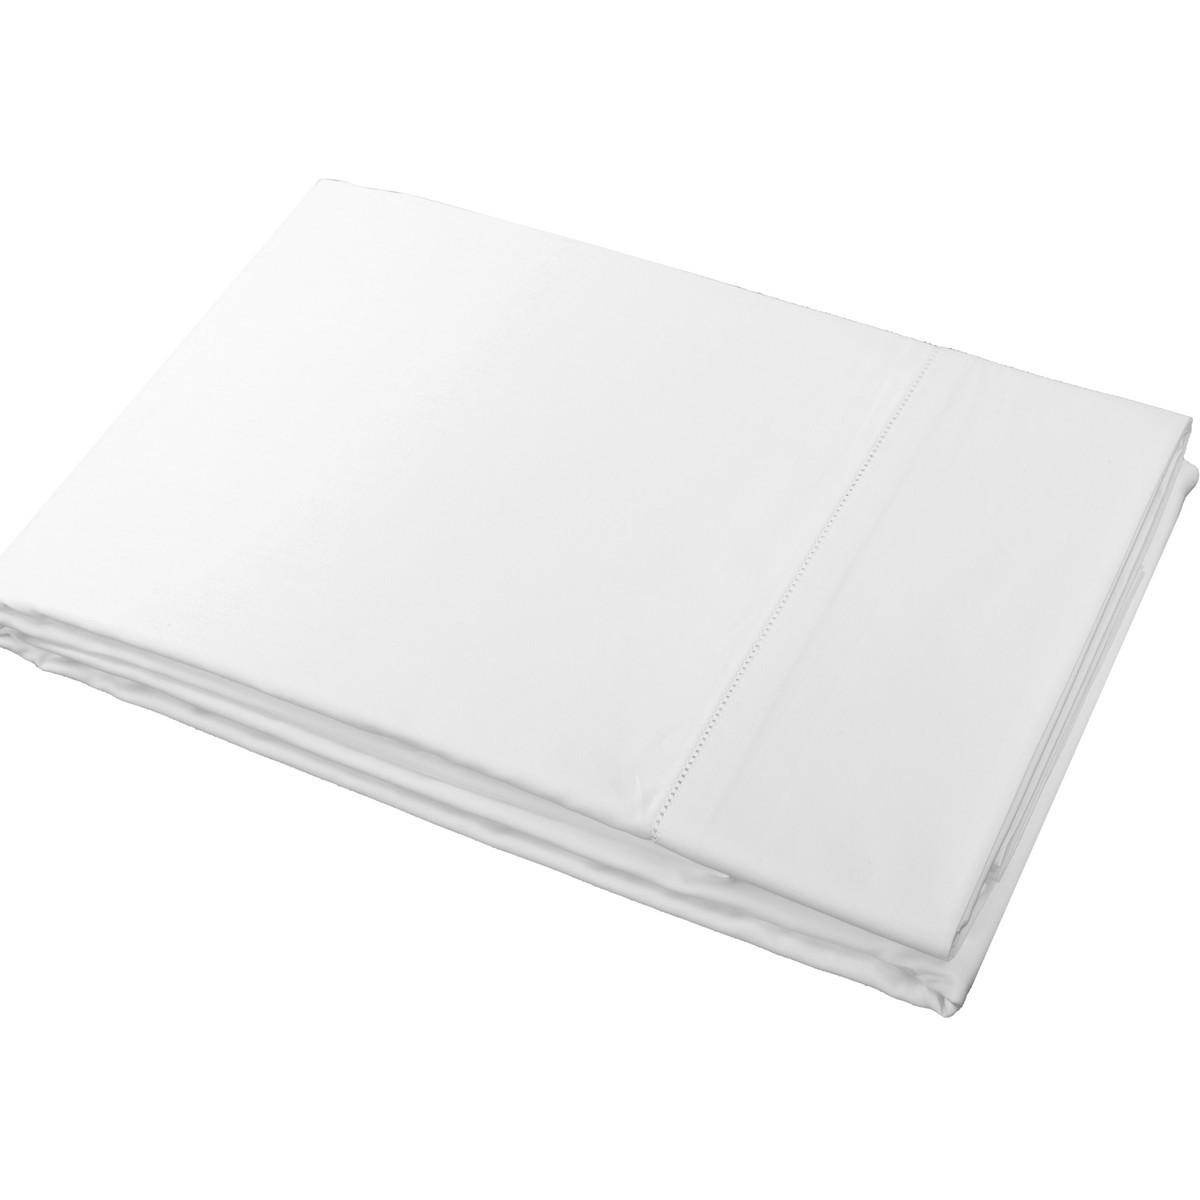 Top Sheet Pure Cotton Satin, LAMEIRINHO